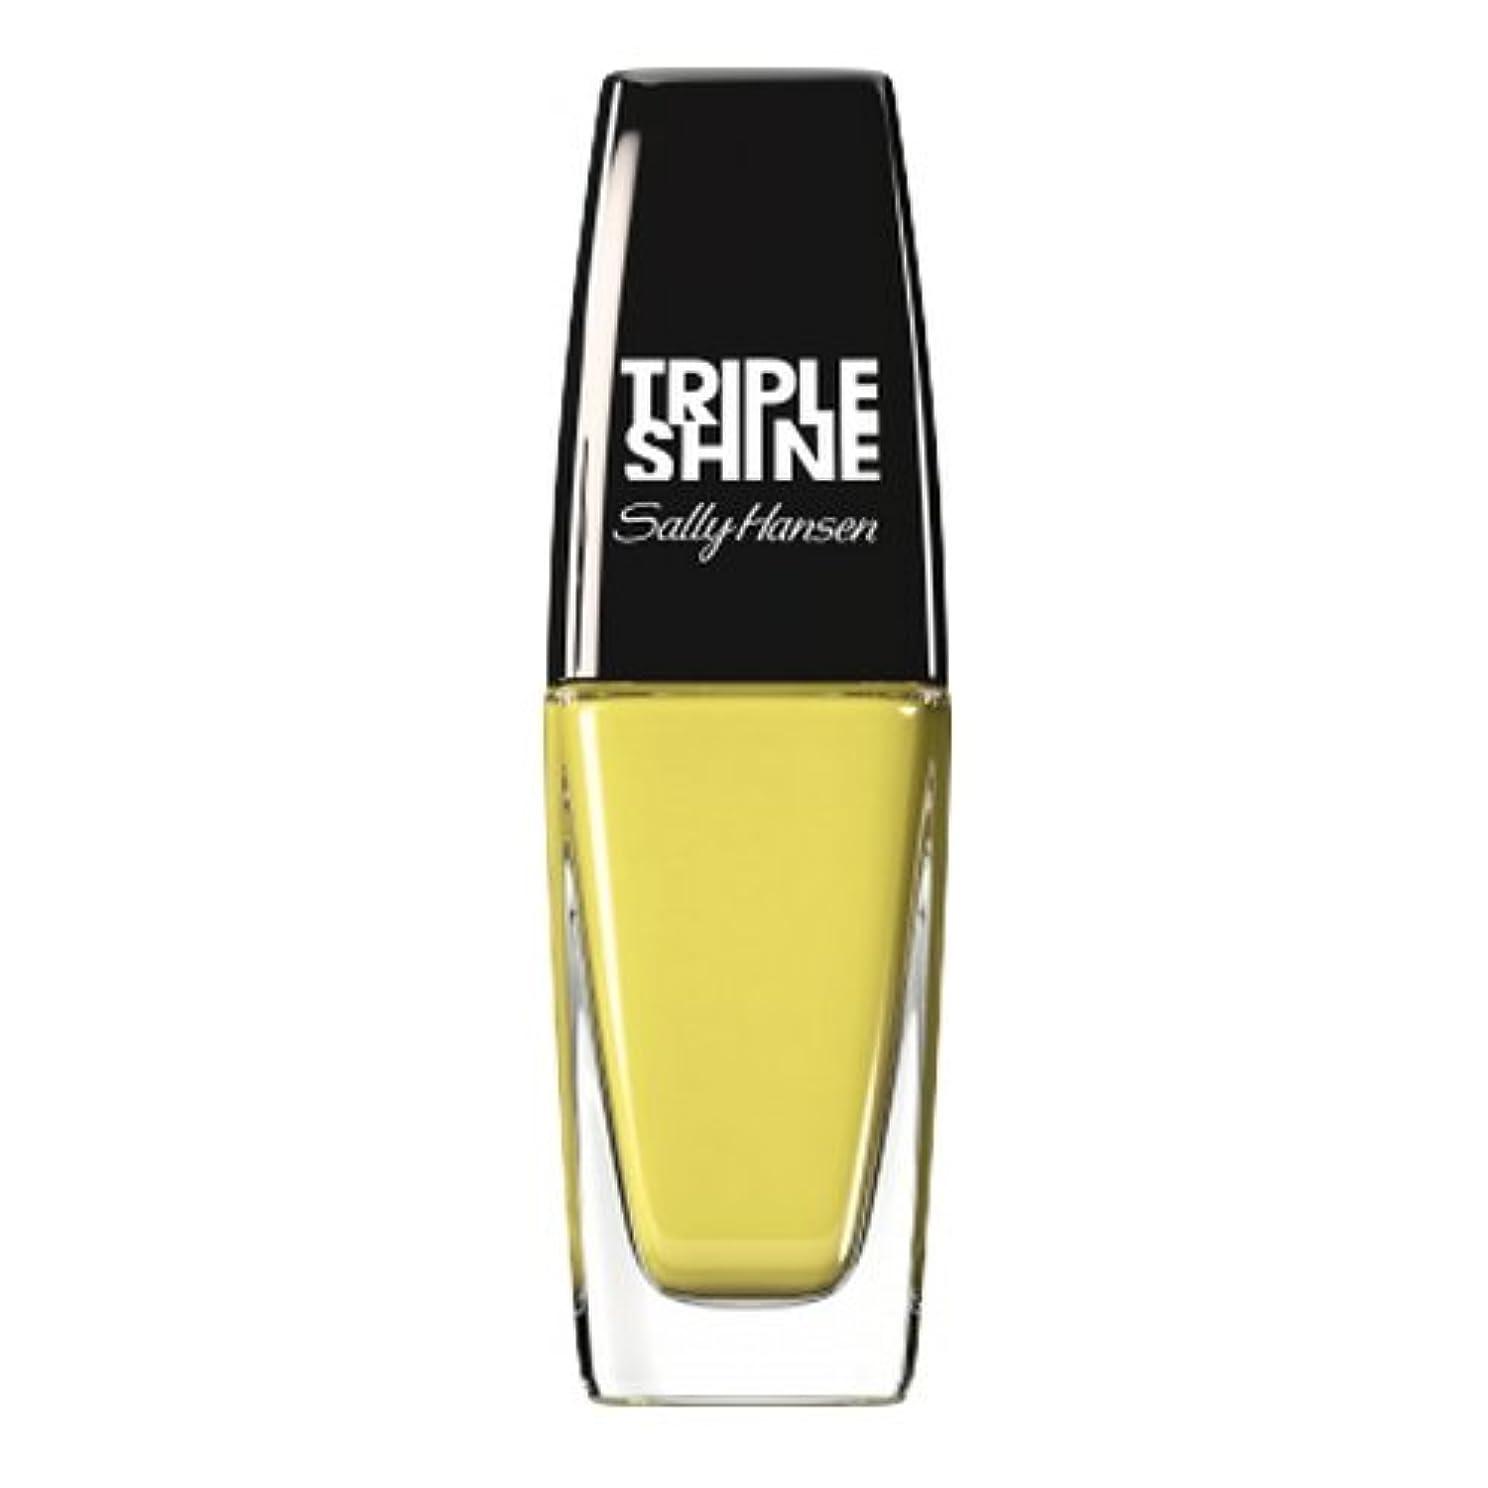 (3 Pack) SALLY HANSEN Triple Shine Nail Polish - Statemint (並行輸入品)